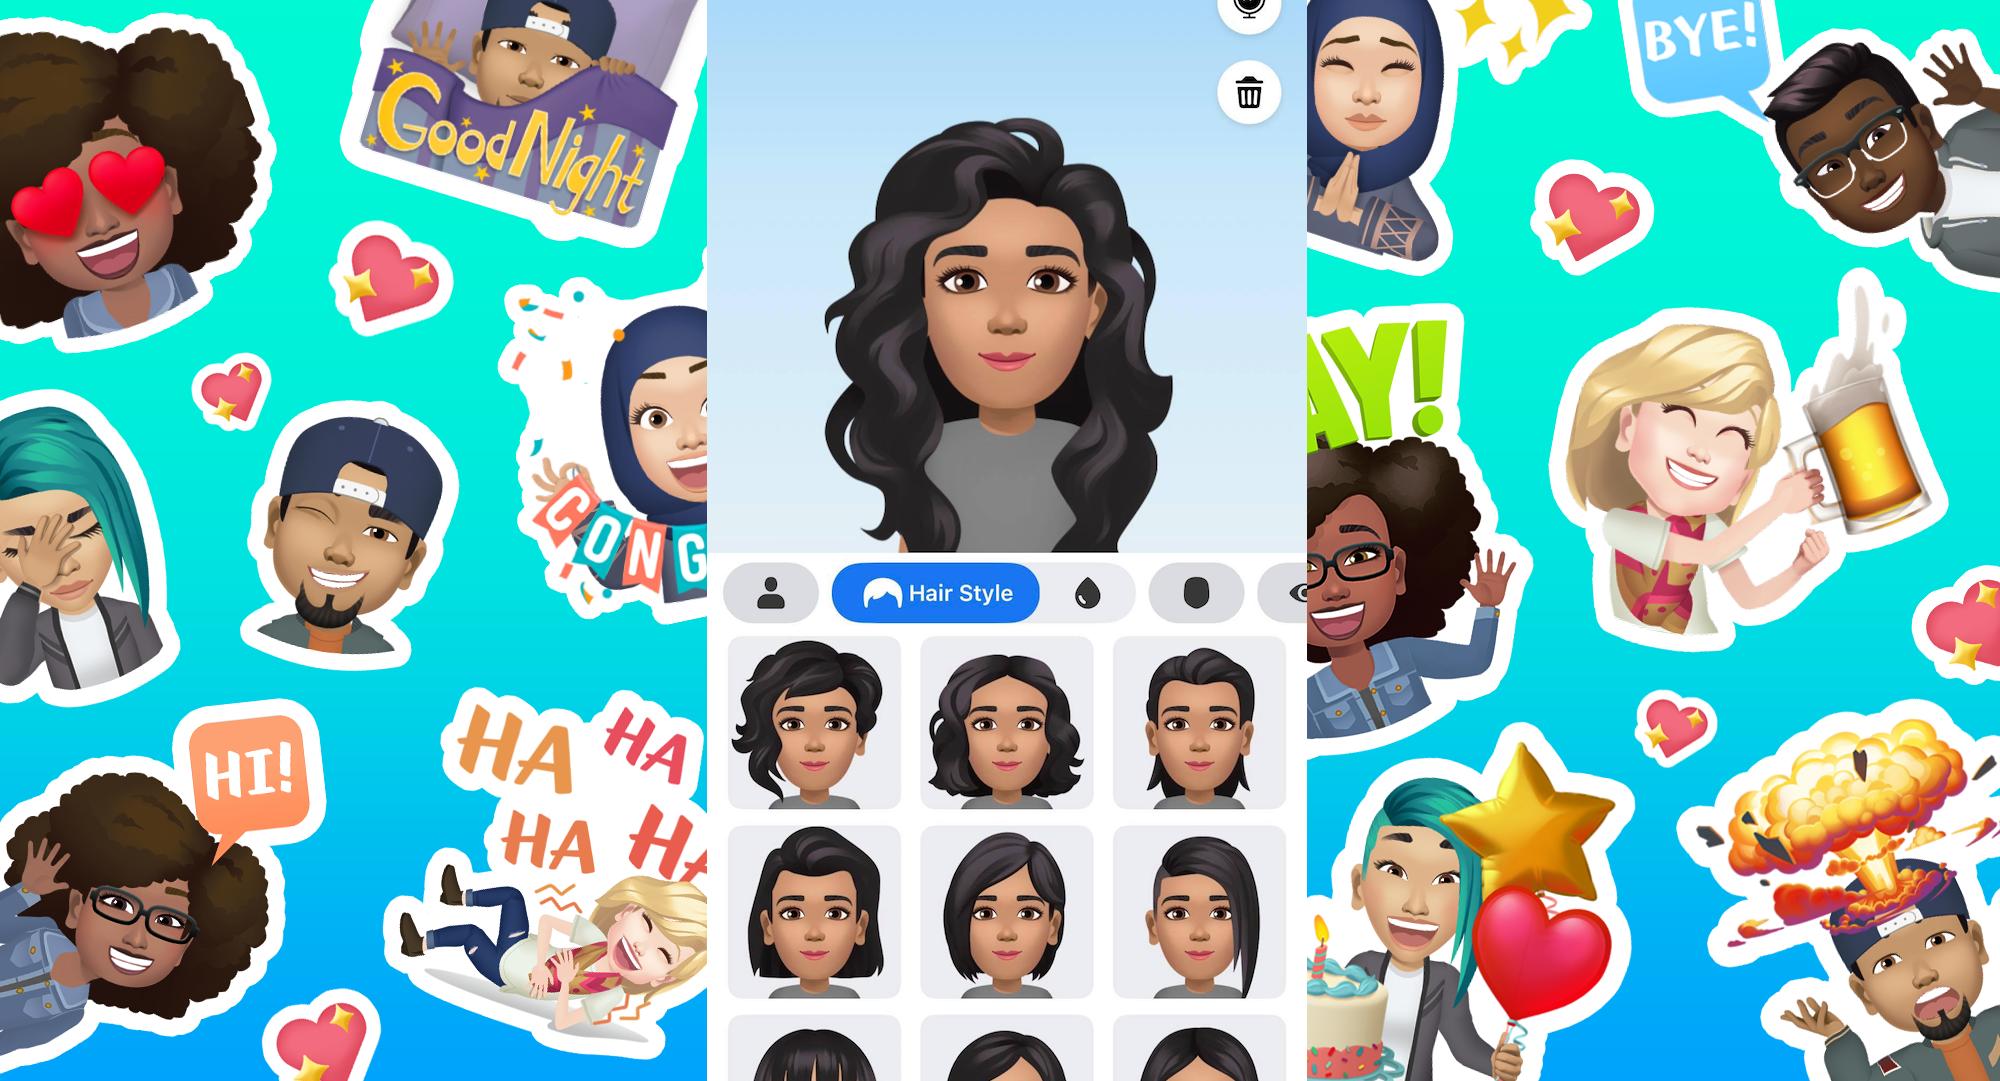 Facebook Introduces Avatars Its Bitmoji Competitor Techcrunch